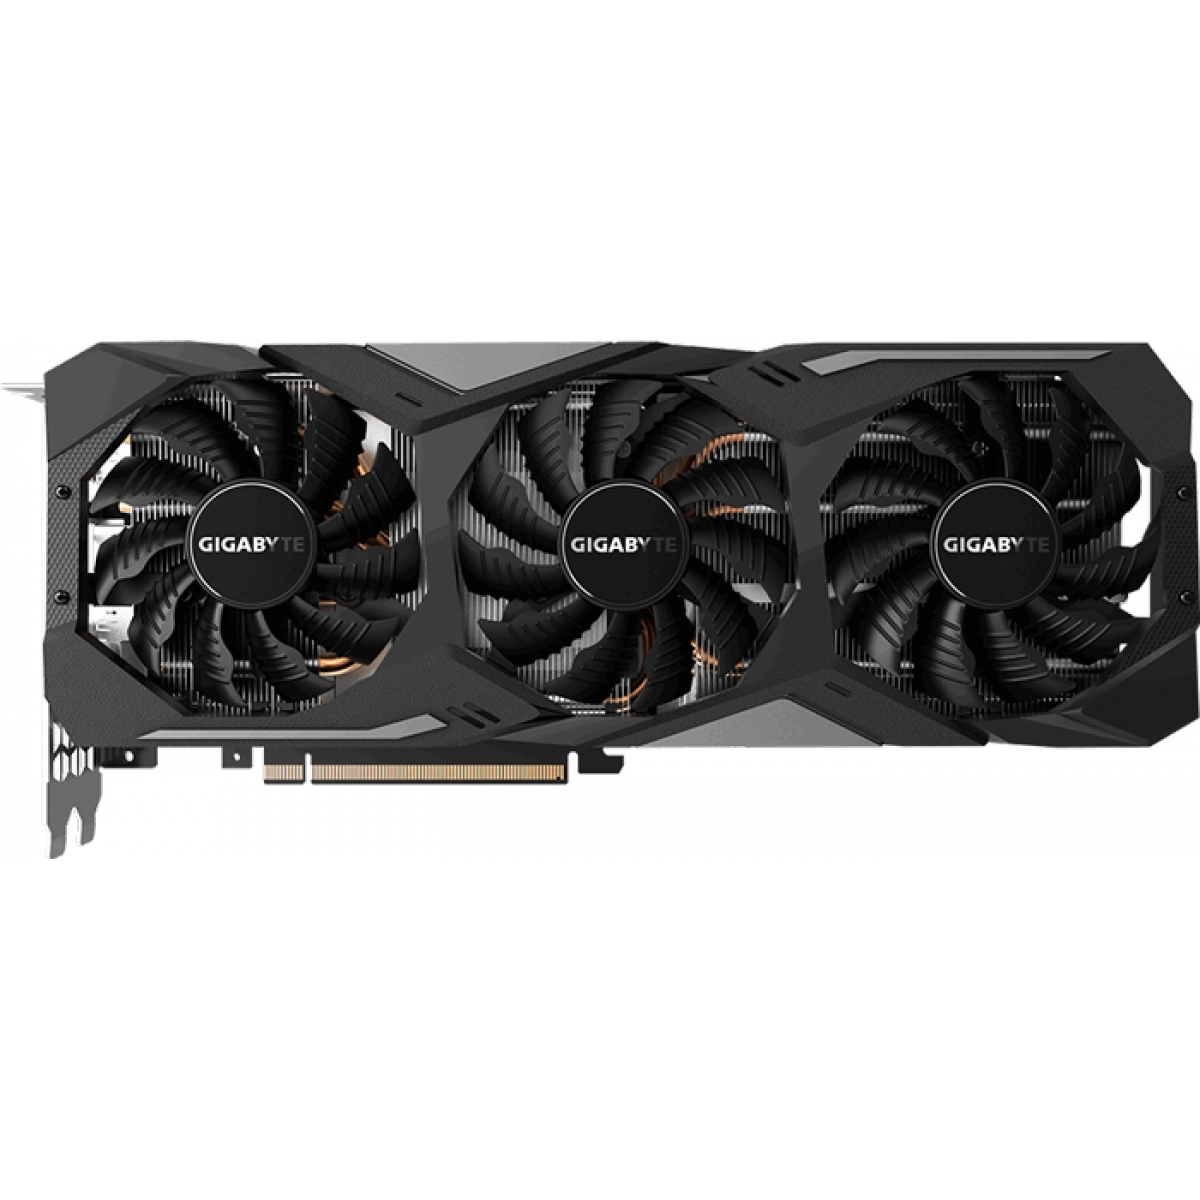 Placa De Vídeo Gigabyte Geforce RTX 2080 Ti Gaming OC, 11GB GDDR6, 352Bit, GV-N208TGAMING OC-11GC